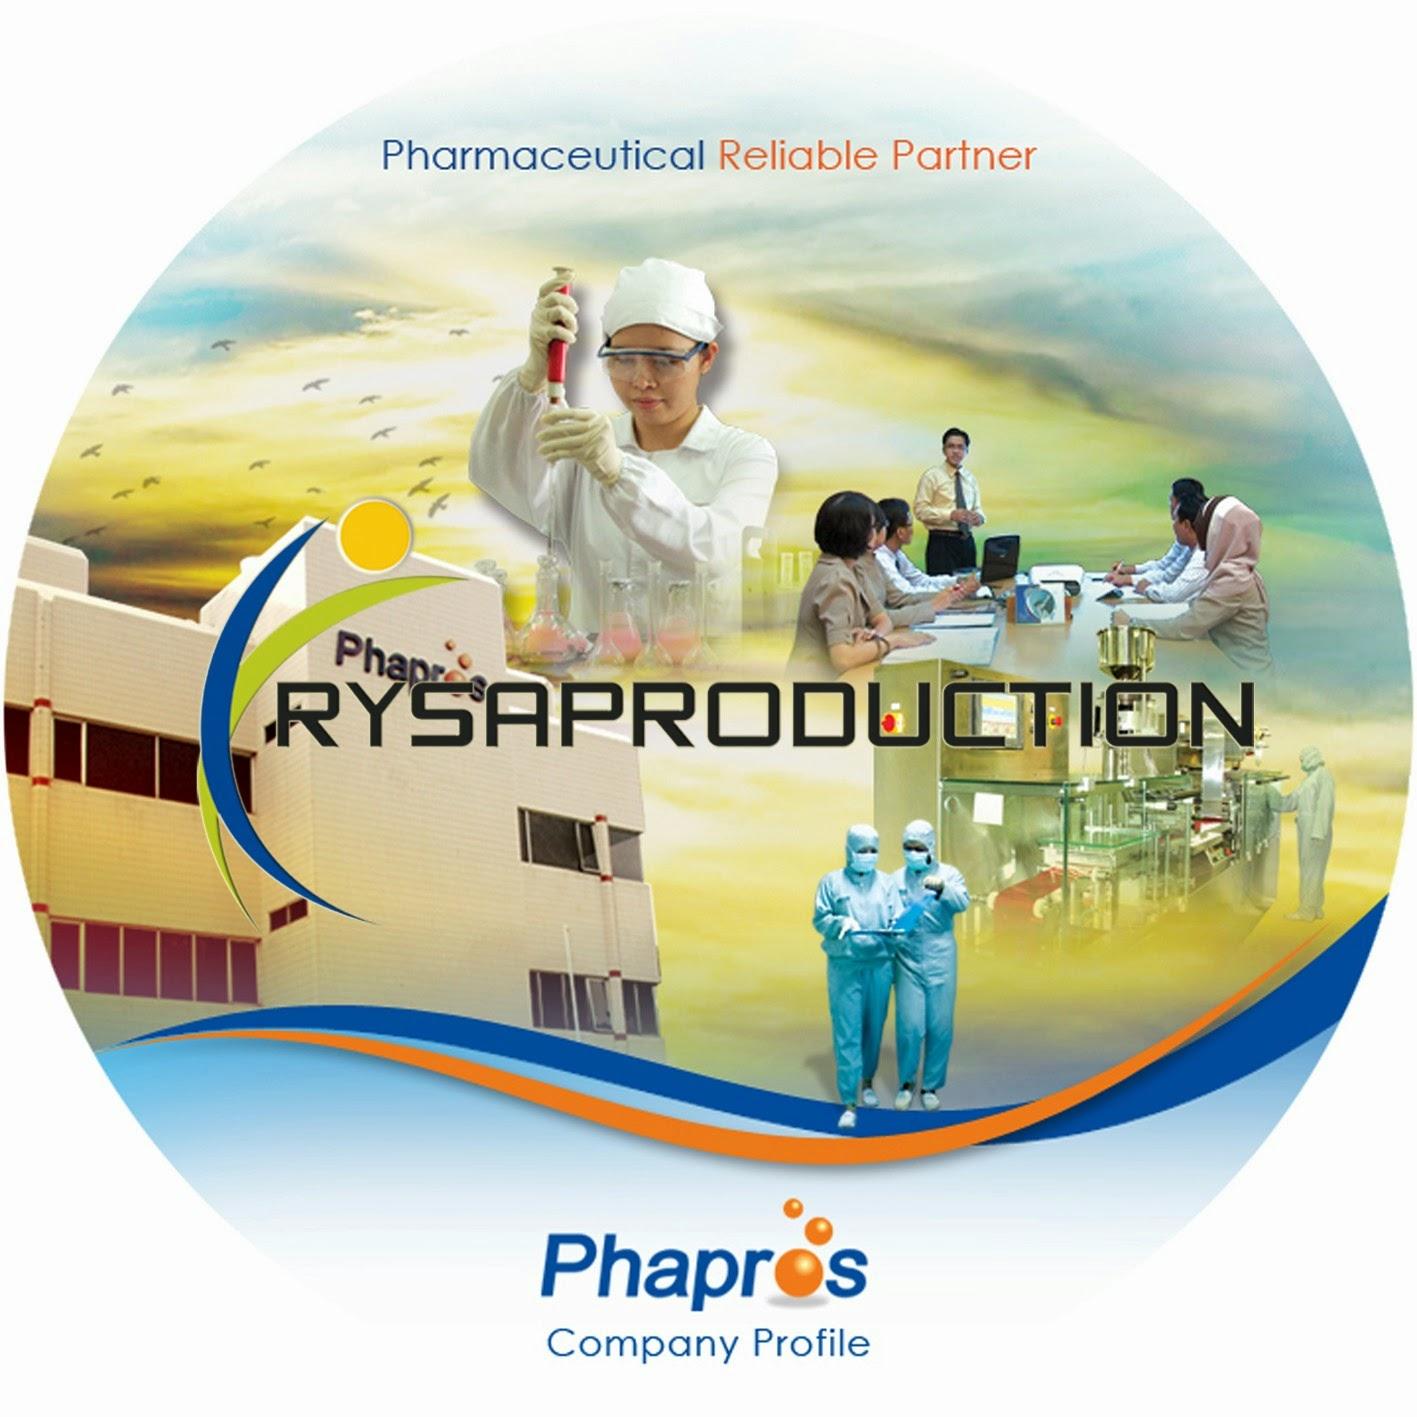 Company Profile Phapros